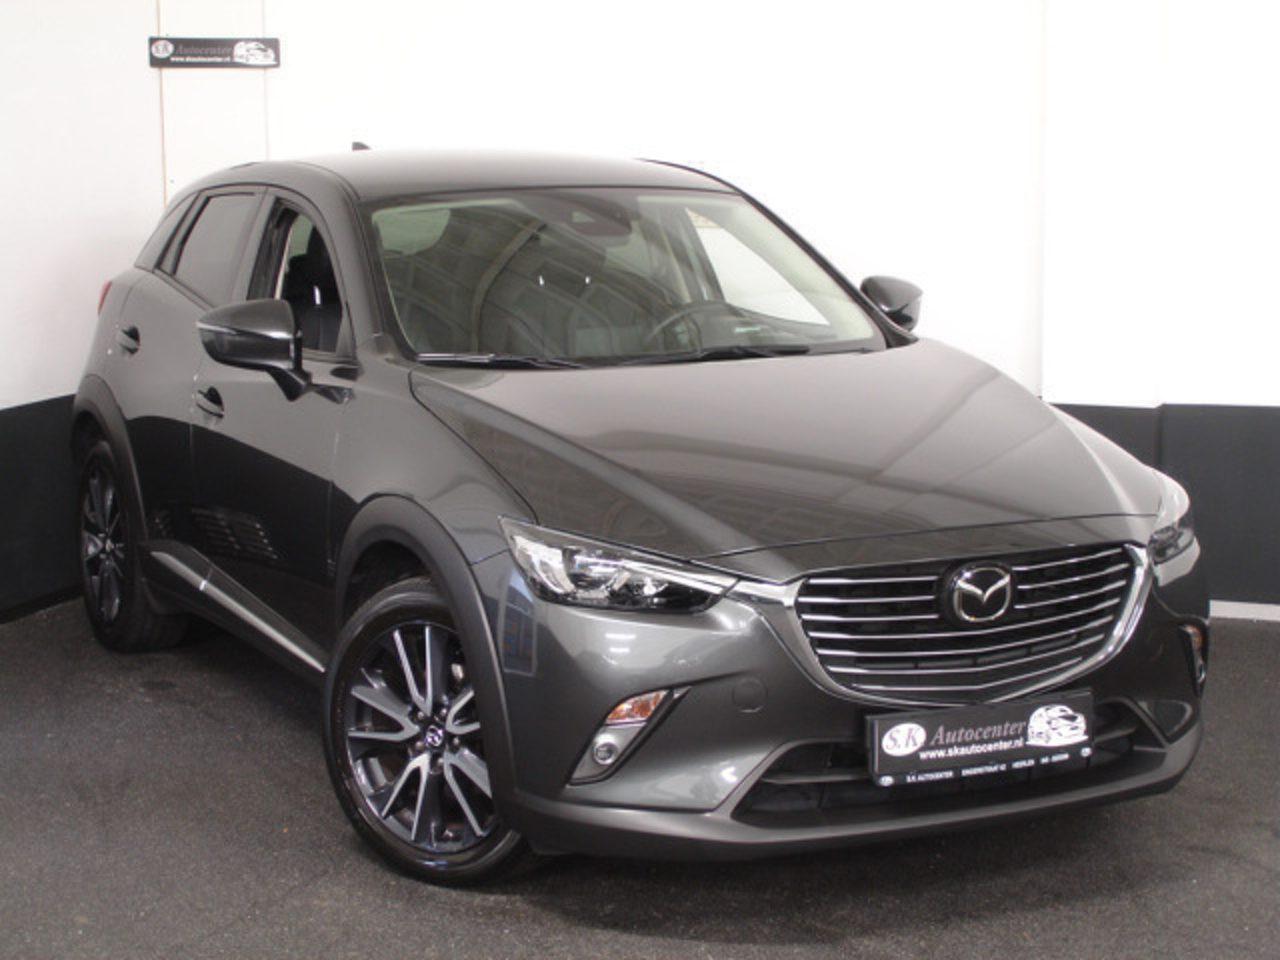 Mazda CX-3 – 2.0 SKYACTIV 1E EIGENAAR GEWELDIG FULL OPTIES